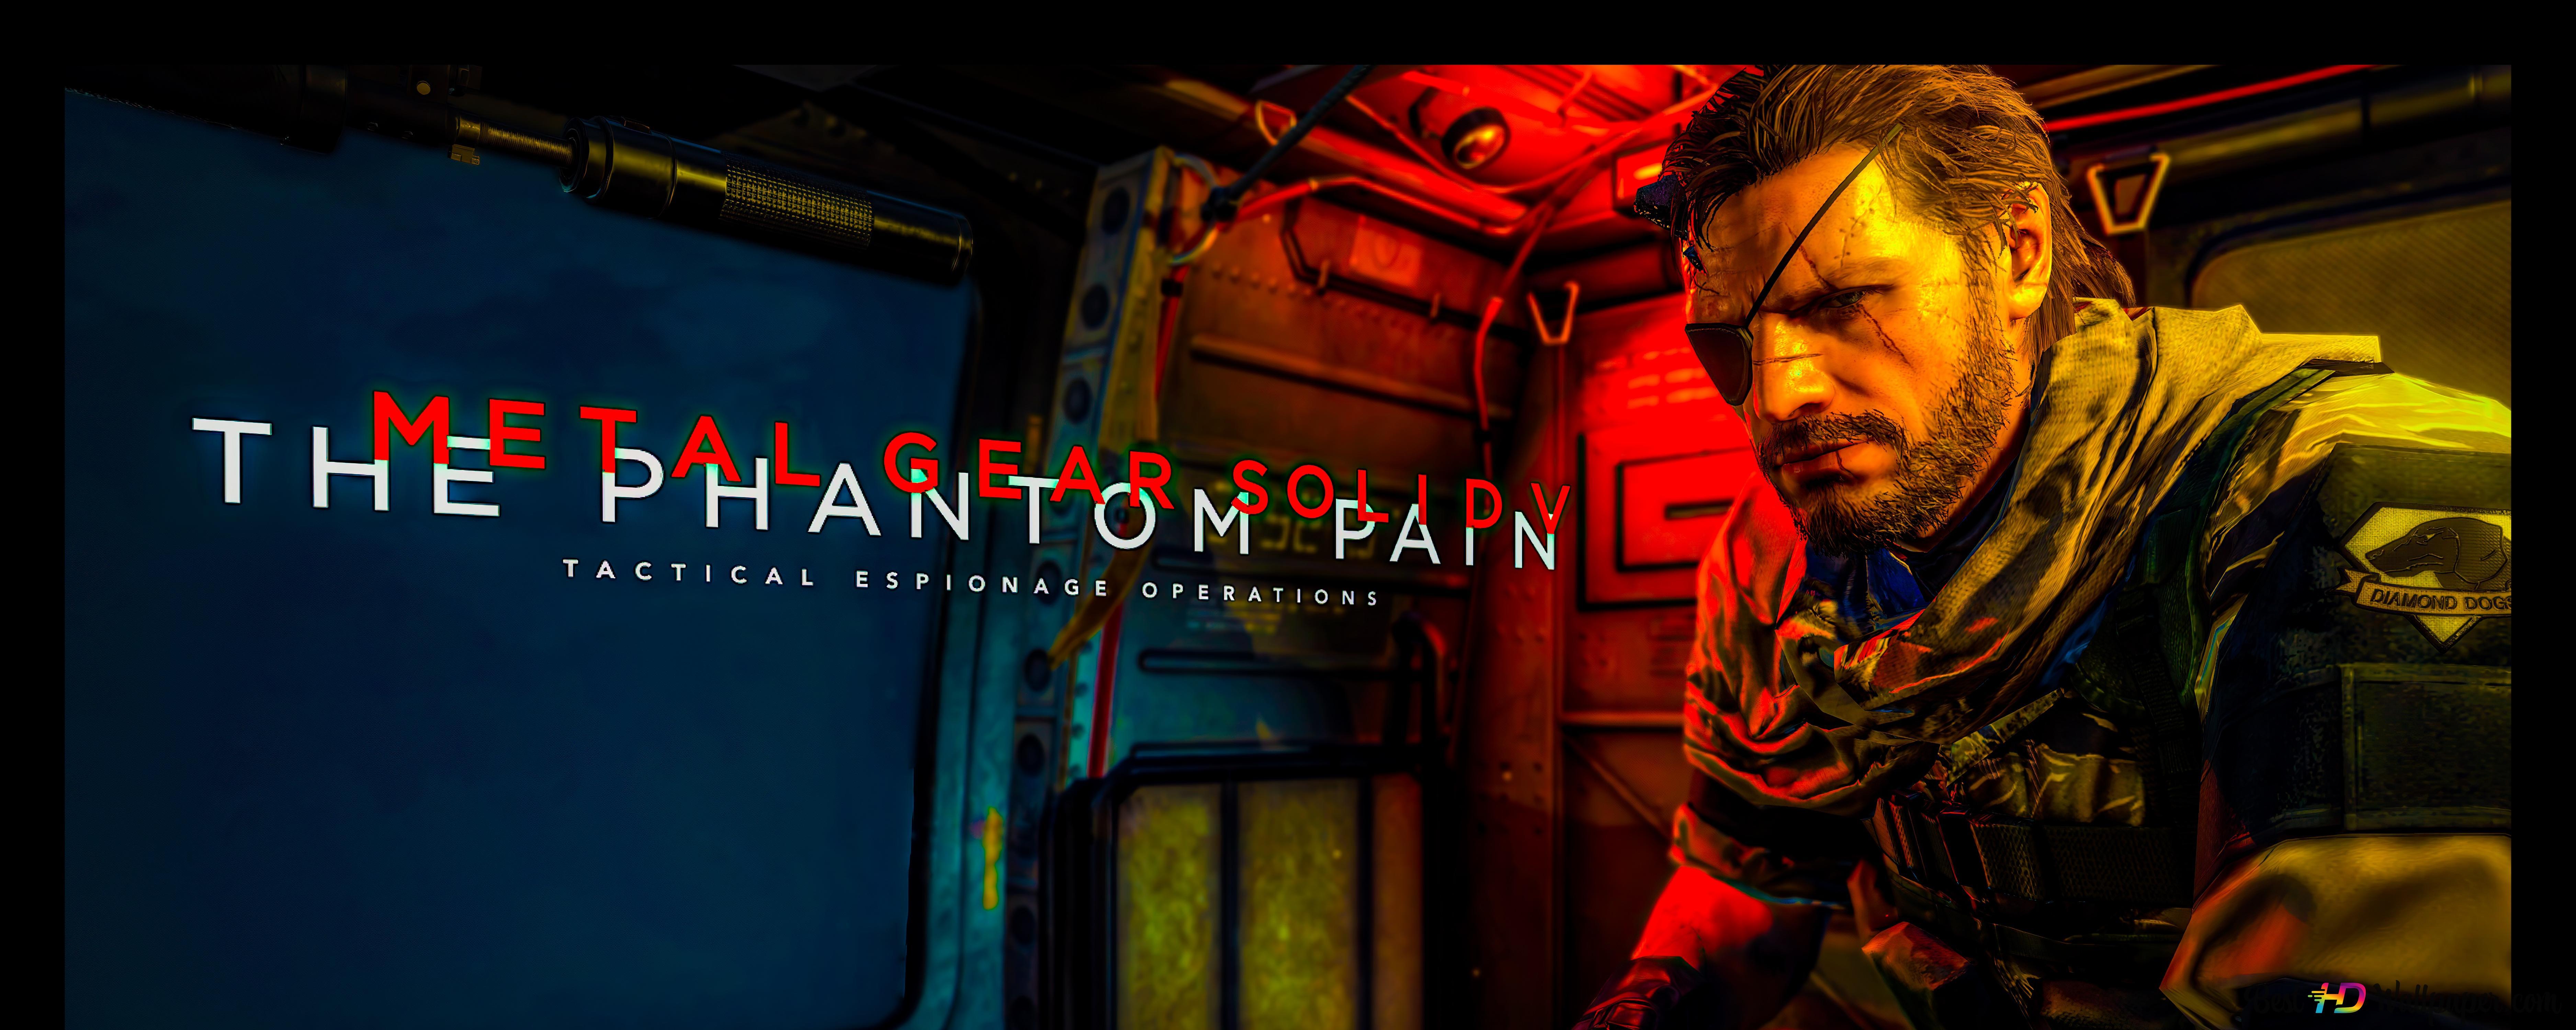 Metal Gear Solid V The Phantom Pain Menu Screen 8k 4k Hd